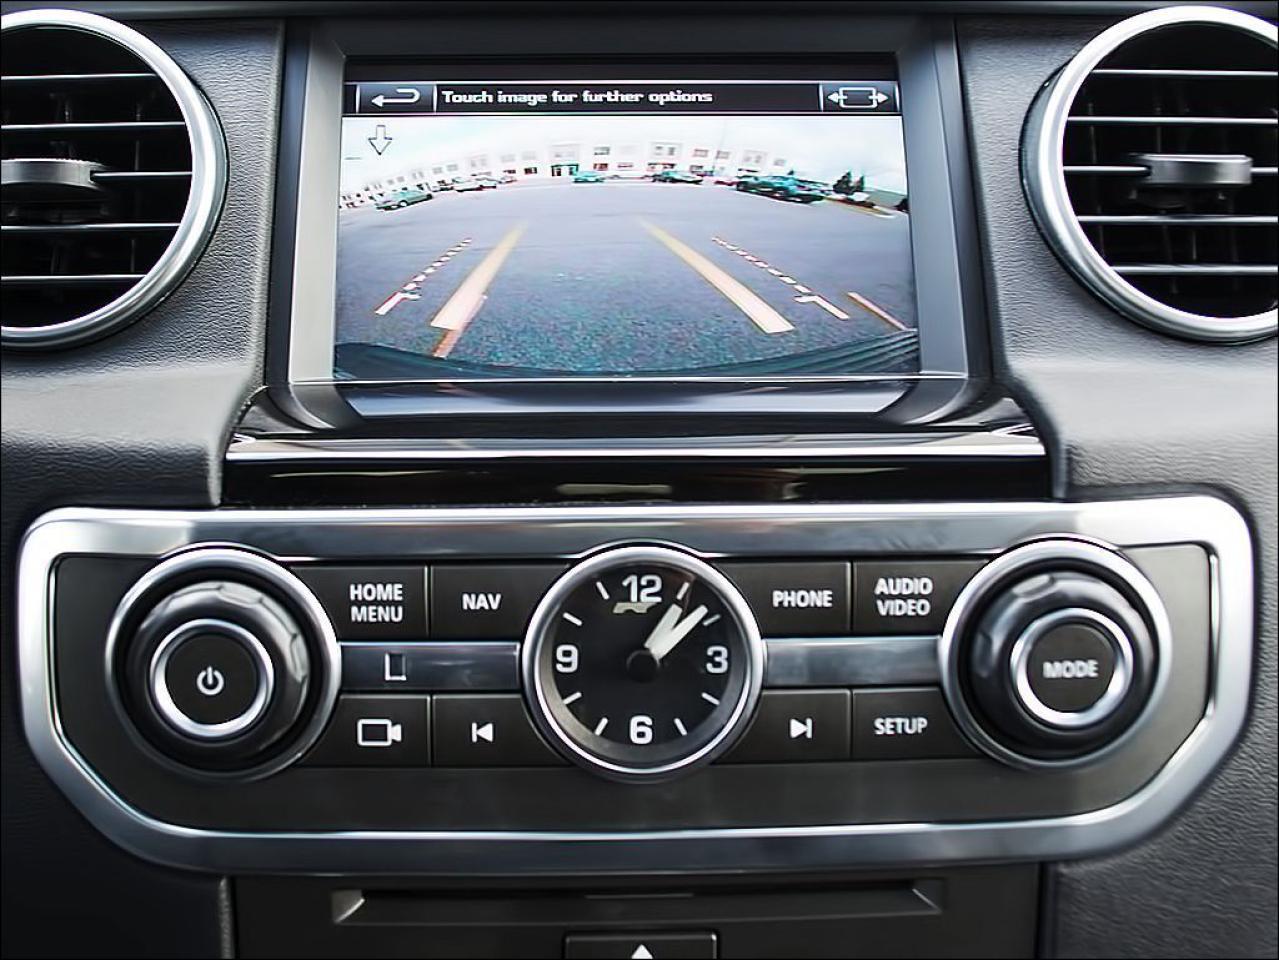 2014 Land Rover LR4 HSE|LUX|NAVI|DUAL DVD|360 CAM|20 inch ALLOYS